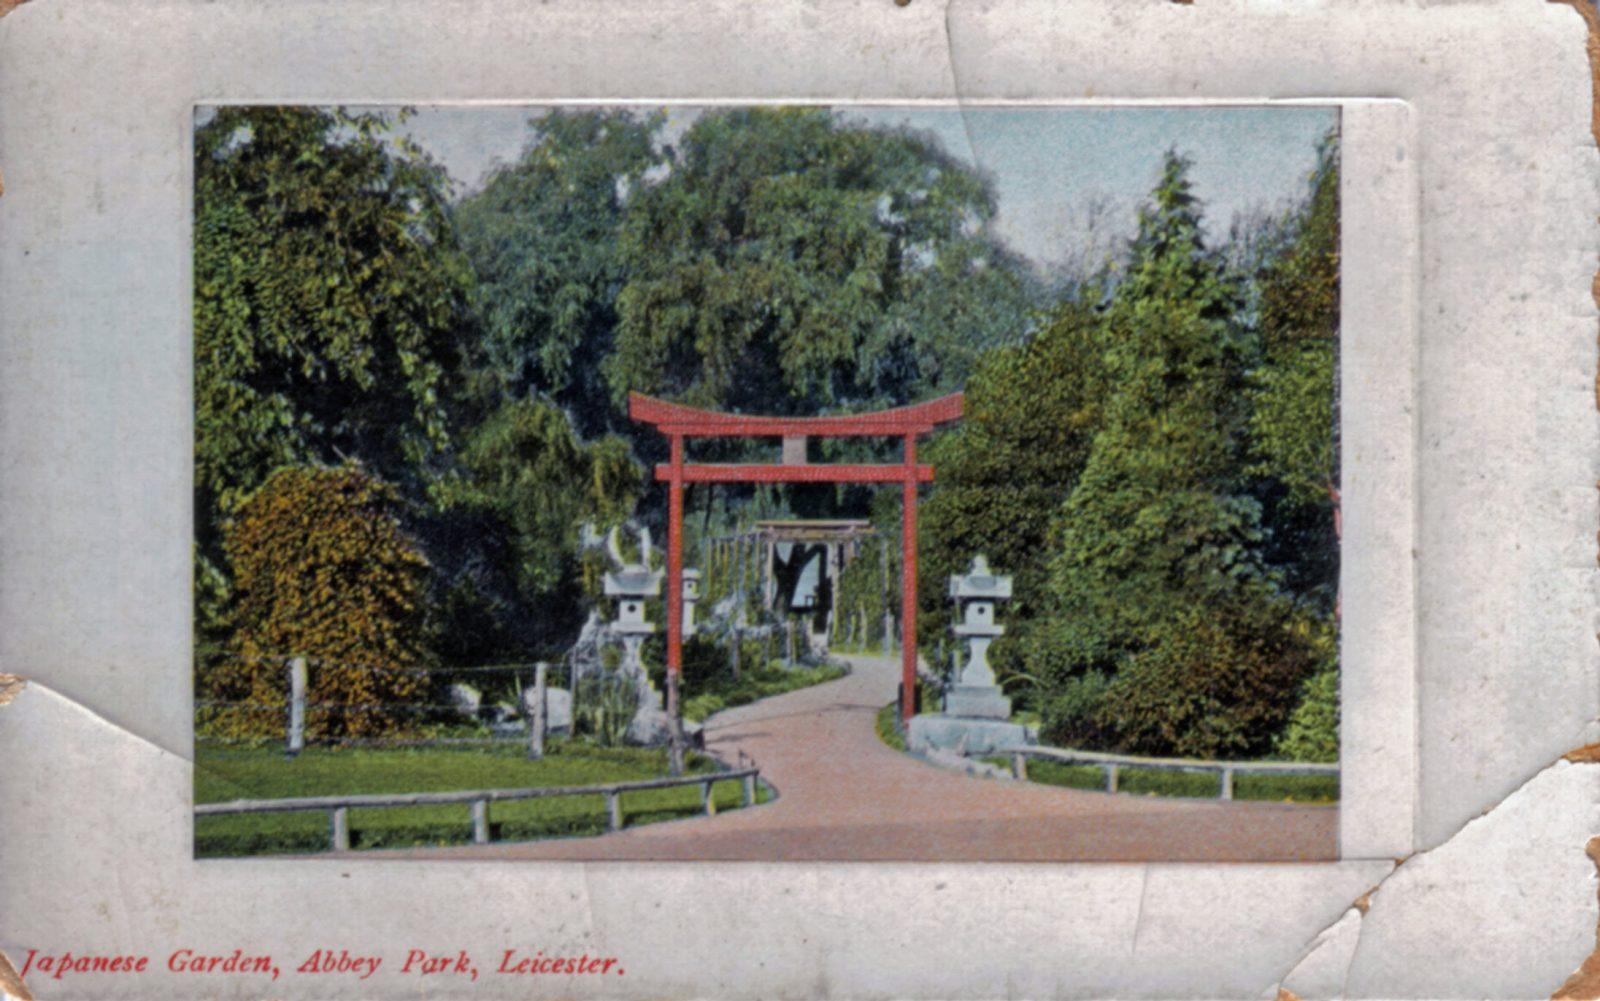 Abbey Park, Leicester. 1901-1920: Entrance to Japanese Garden. (File:1021)